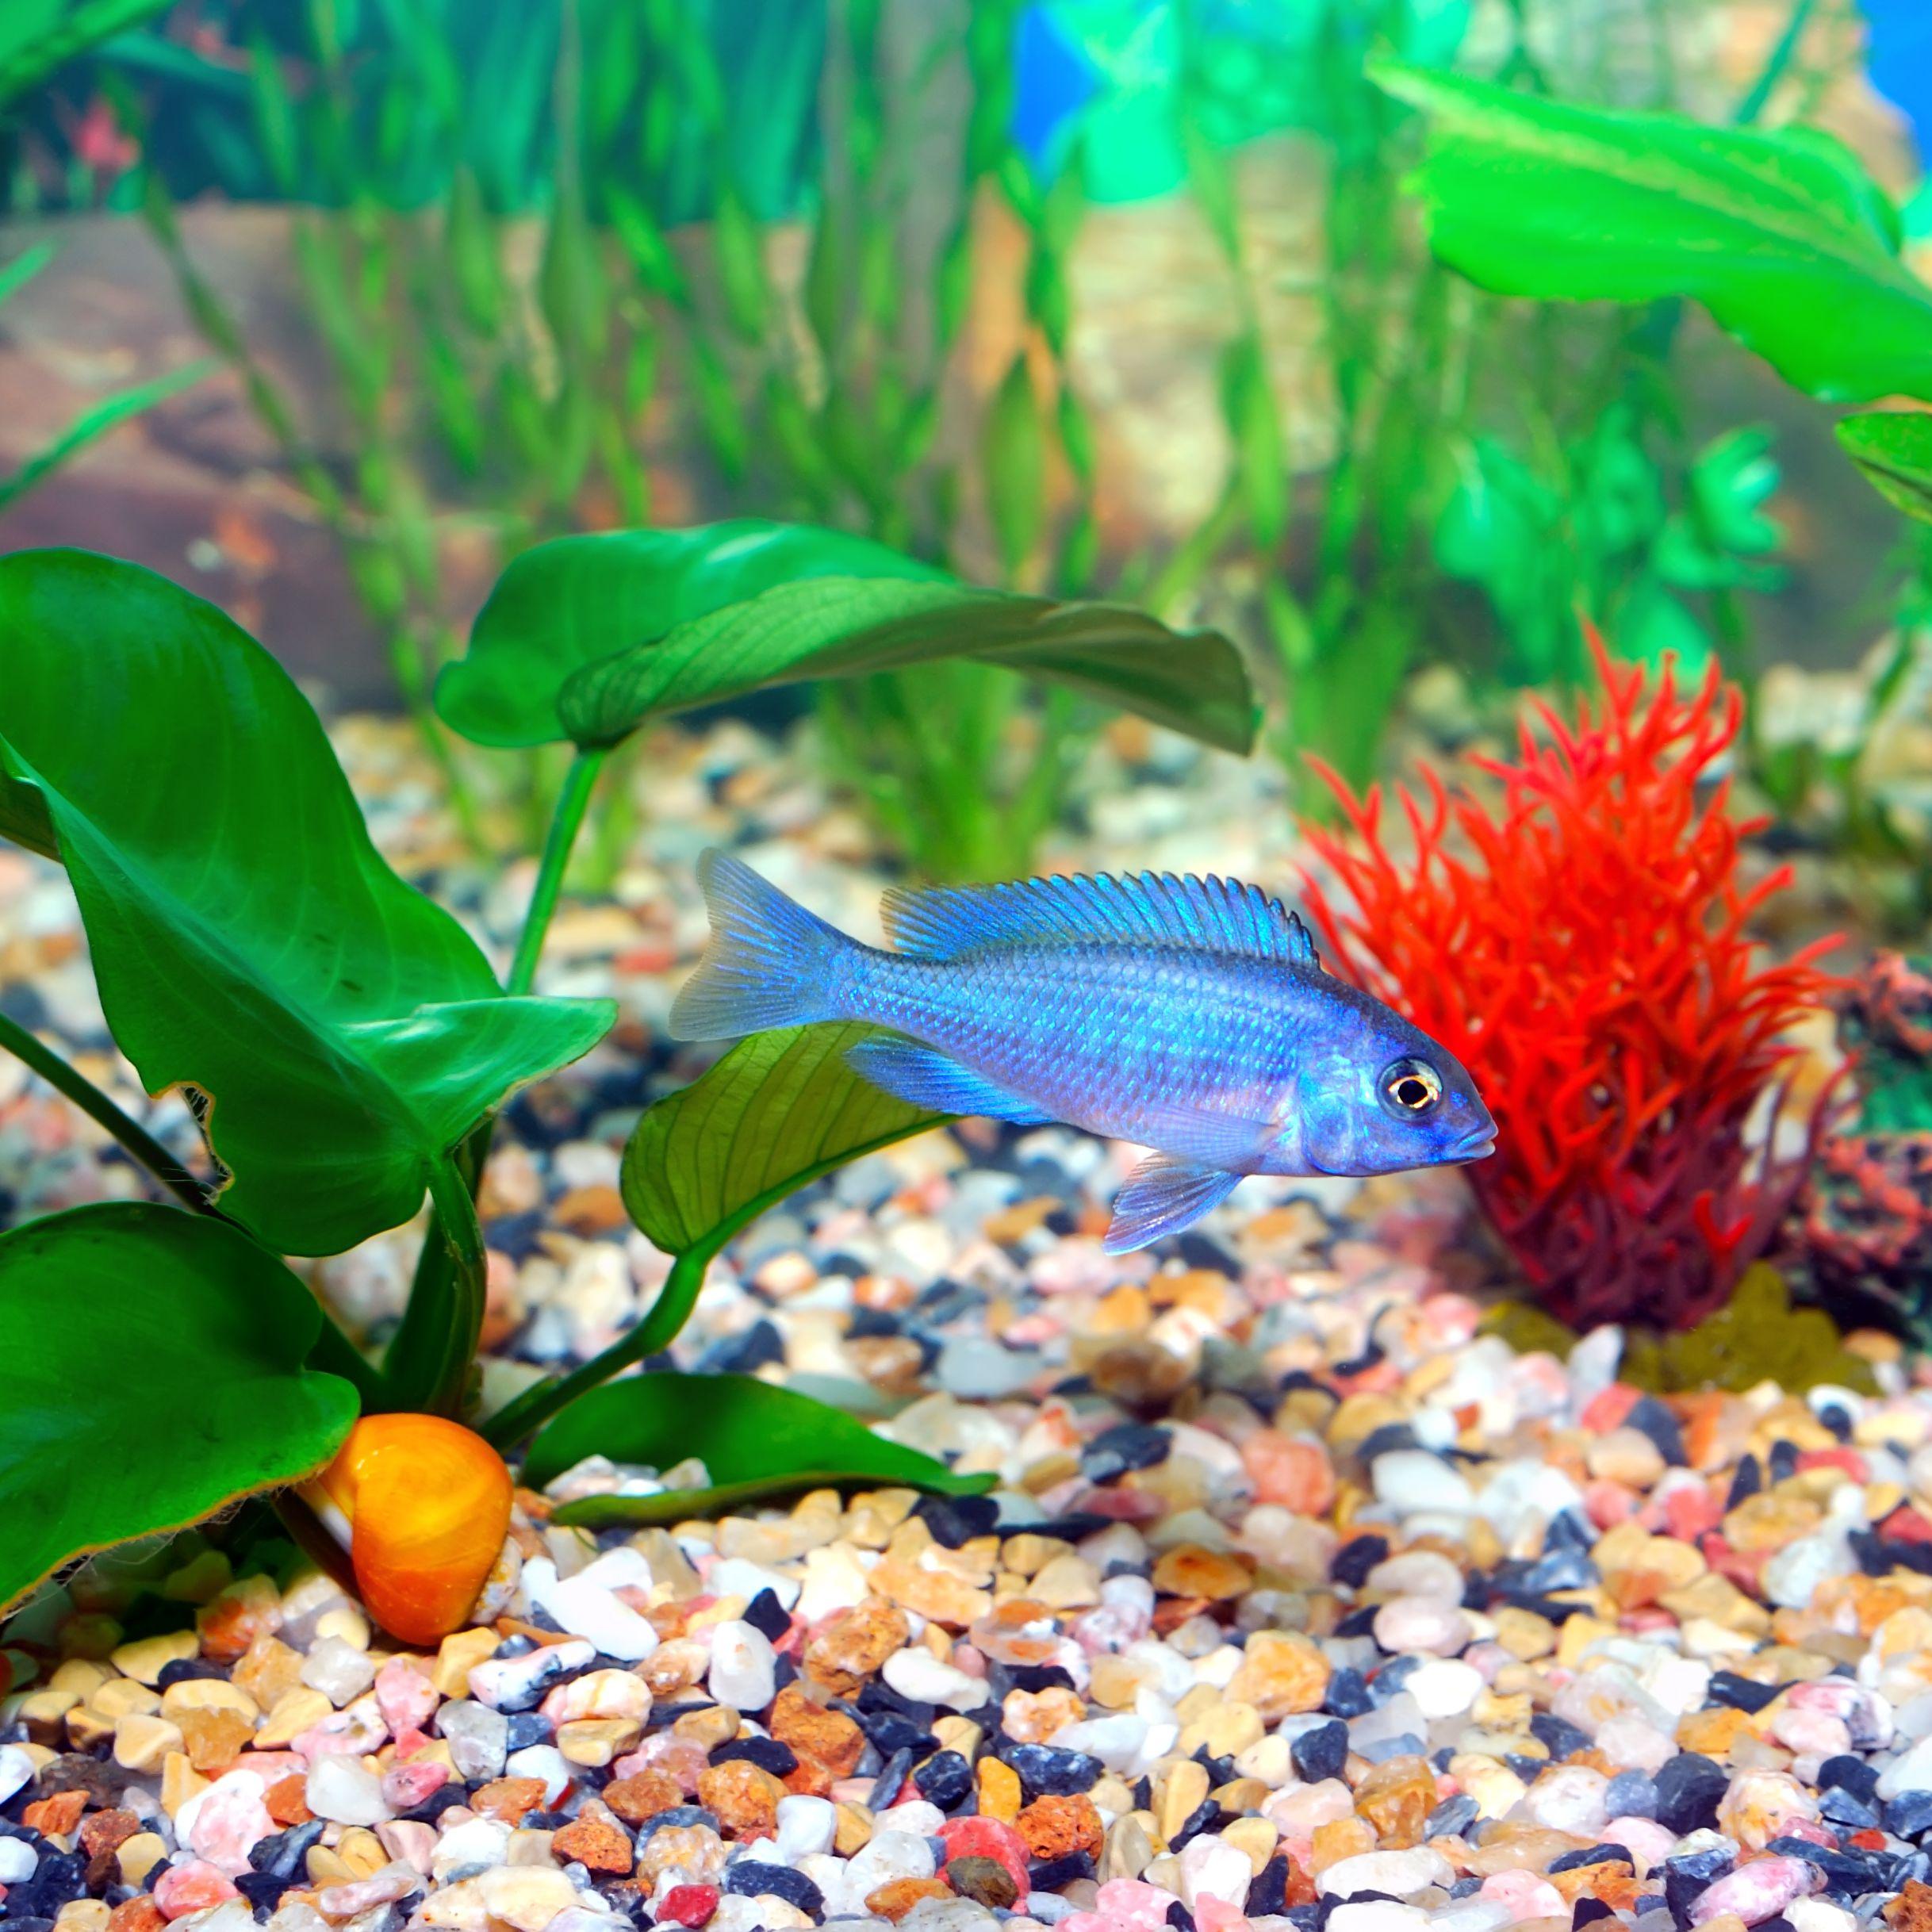 Tips For Aquarium Filter Media Packing Order